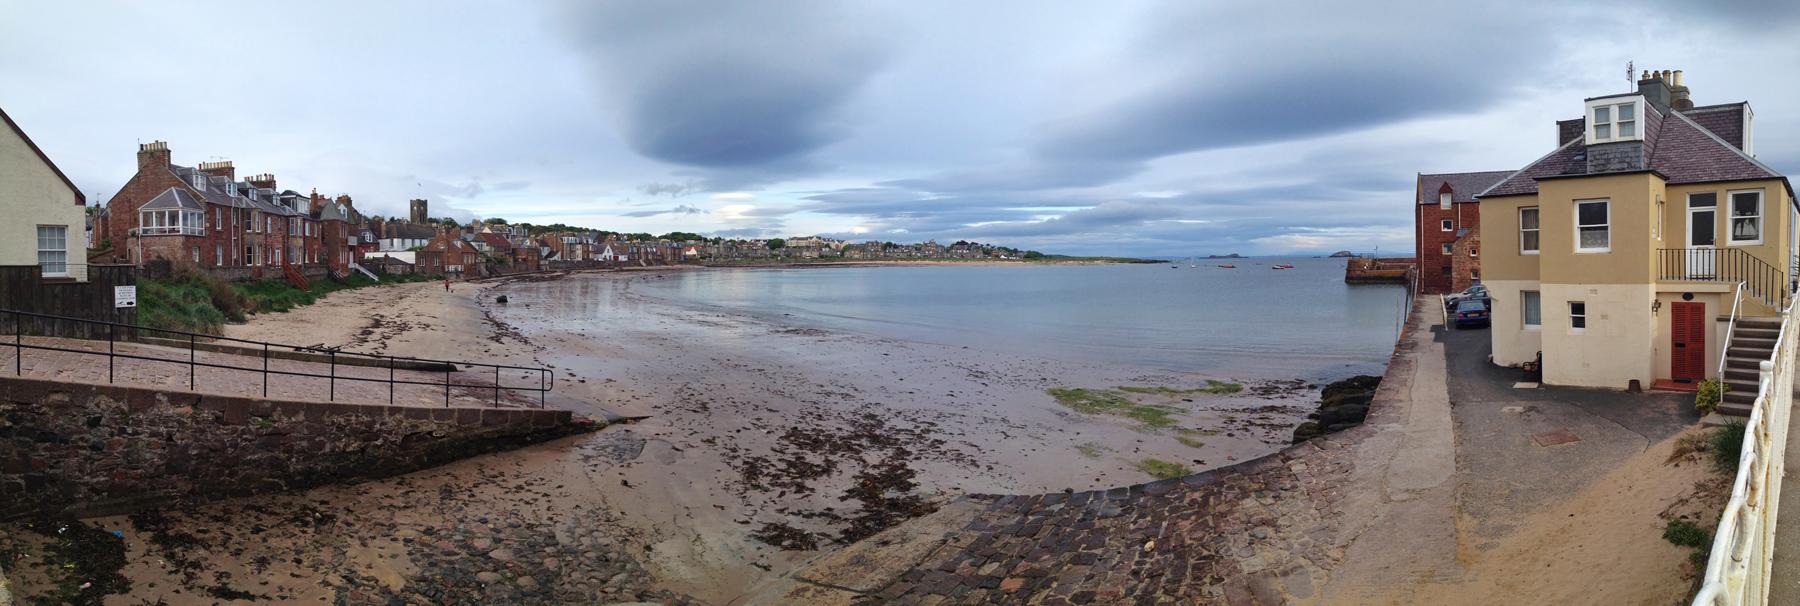 North Berwick low tide, Scotland...